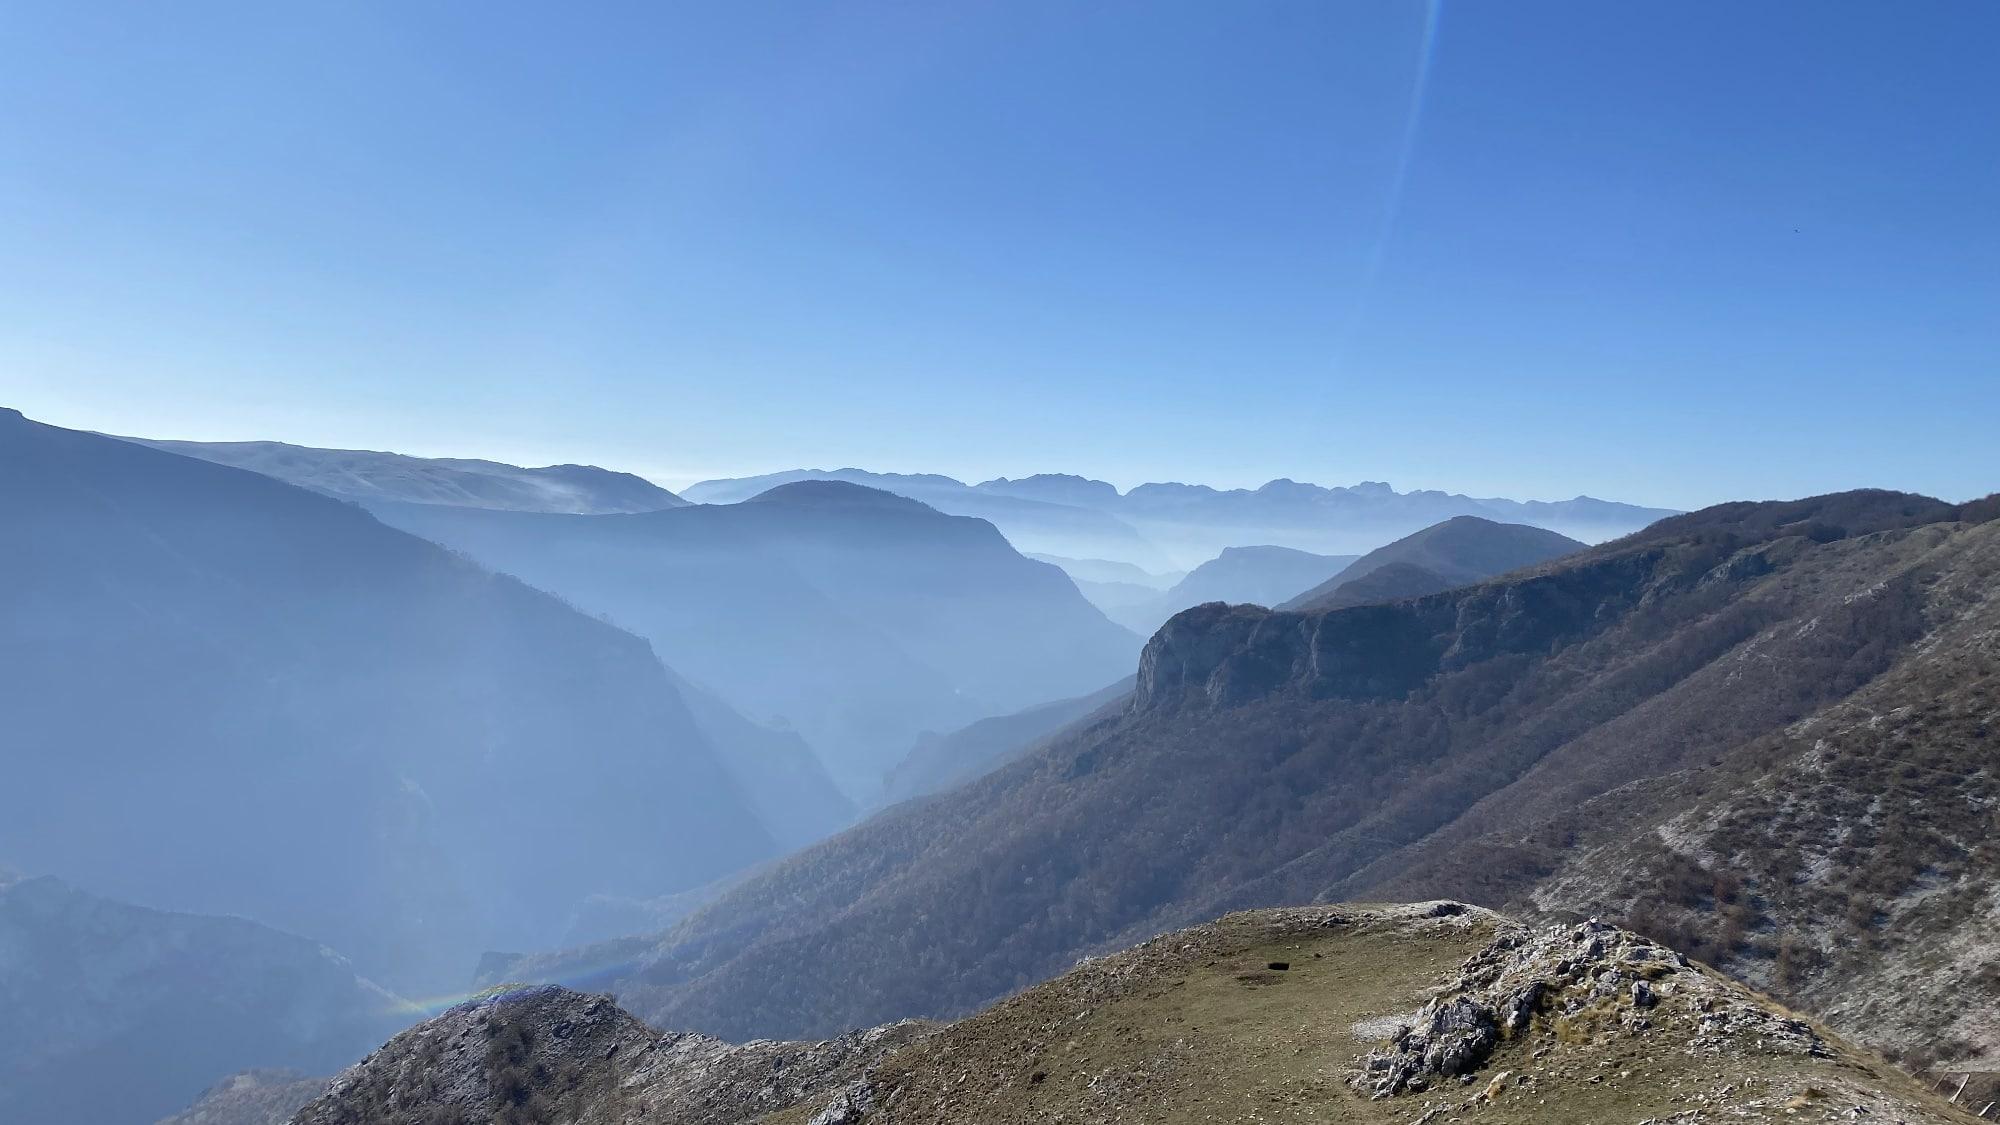 So close to heaven - In The Mountain Village Lukomir 14